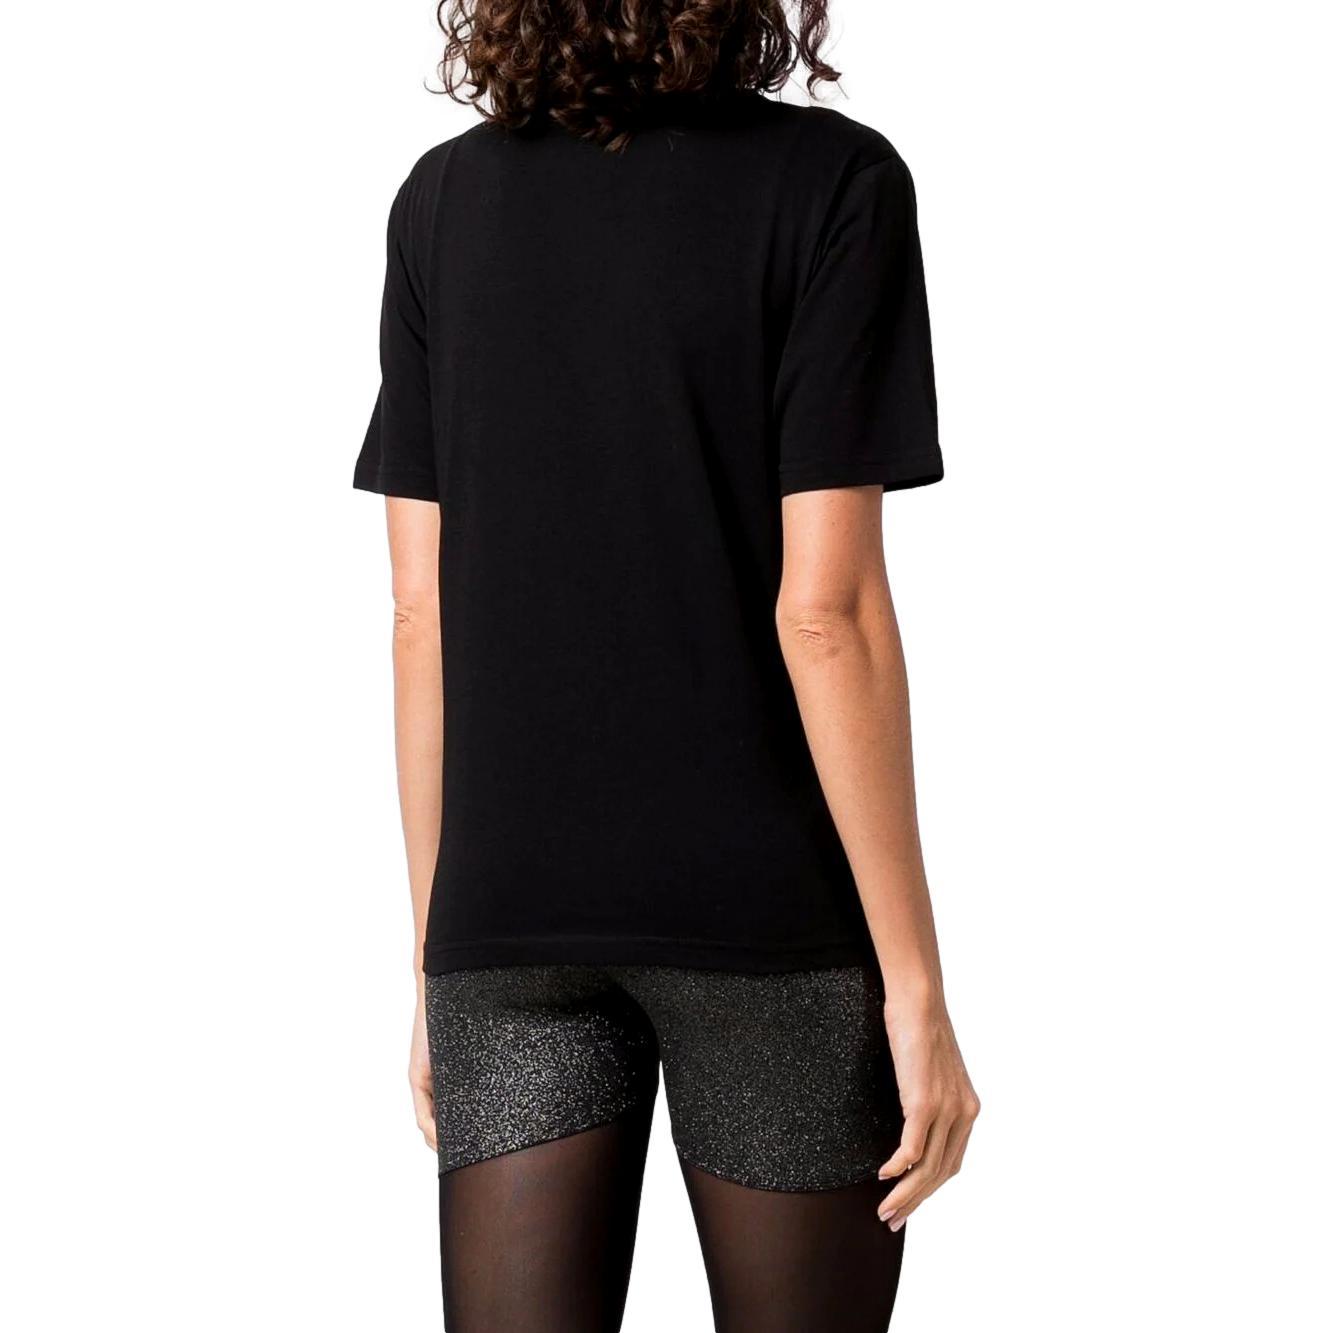 T-shirt with embroidery CHIARA FERRAGNI |  | 71CBHT01 CJC0T899